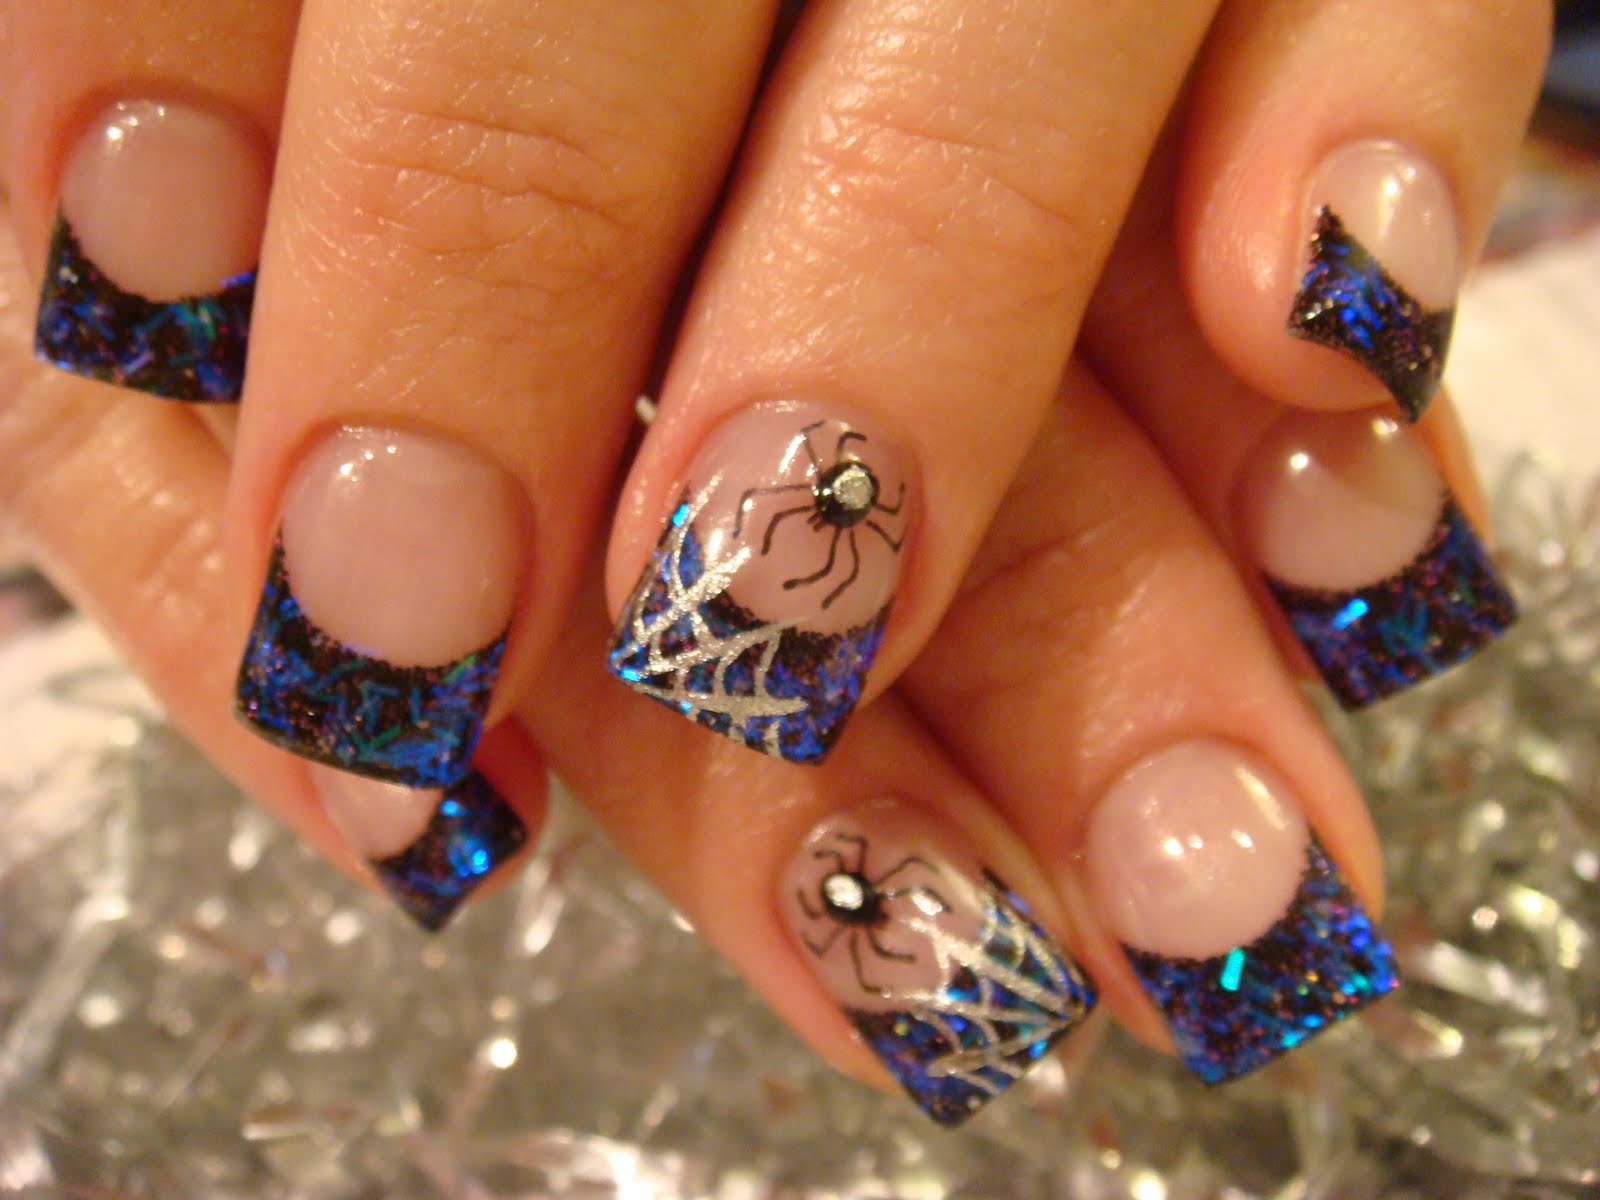 Nail art october 2010 - Nail art halloween ...